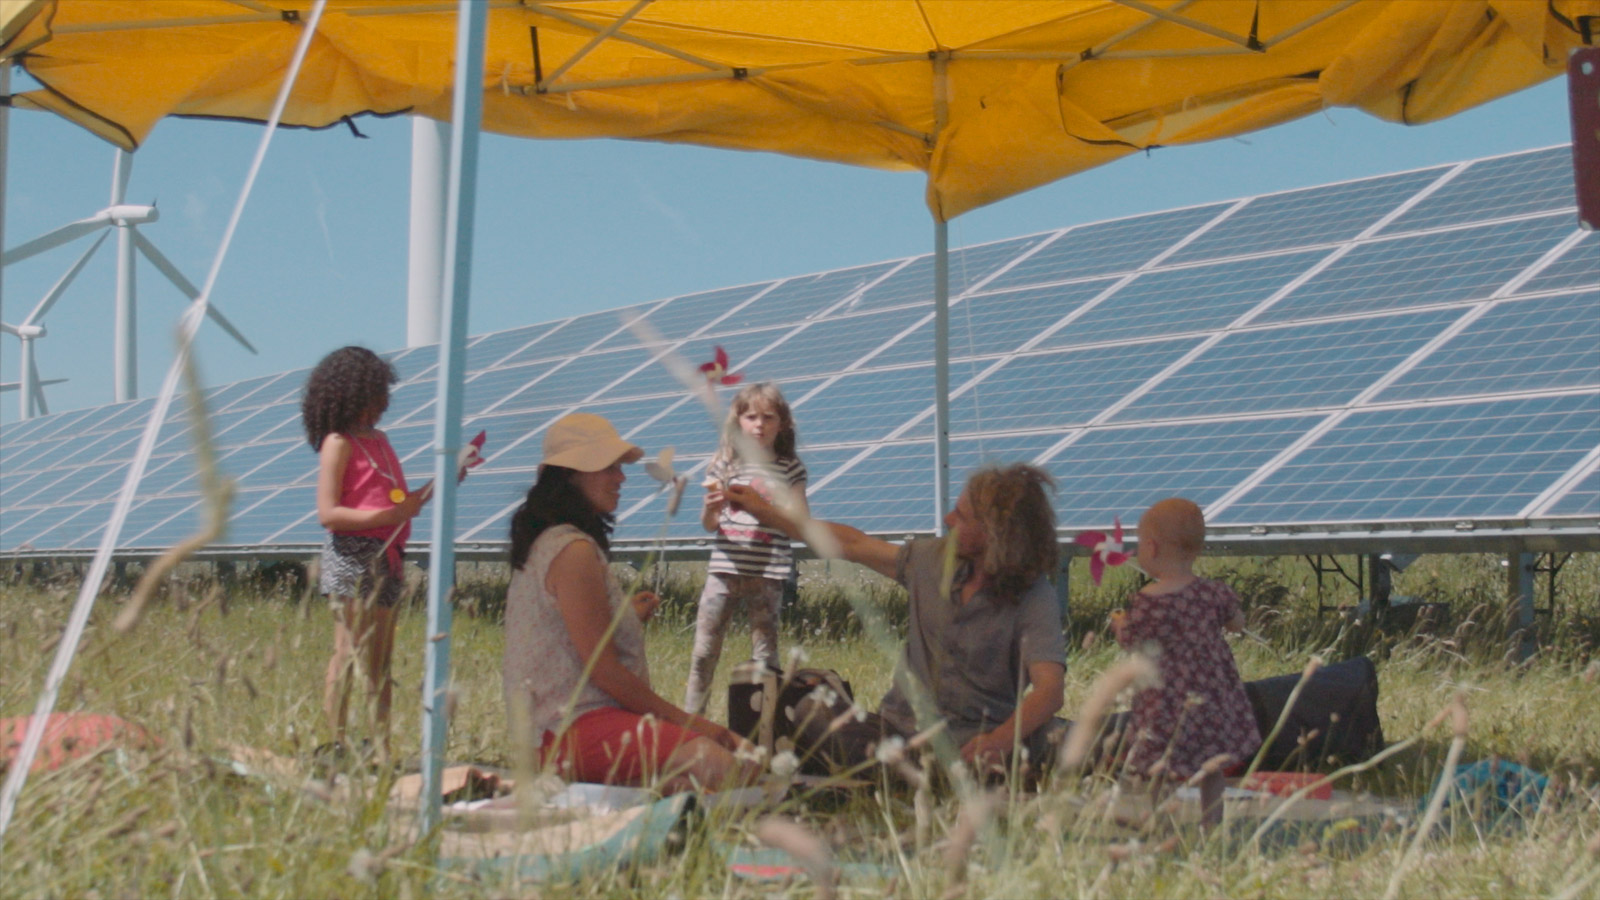 Westmill community solar farm, photo by Ross Gill.